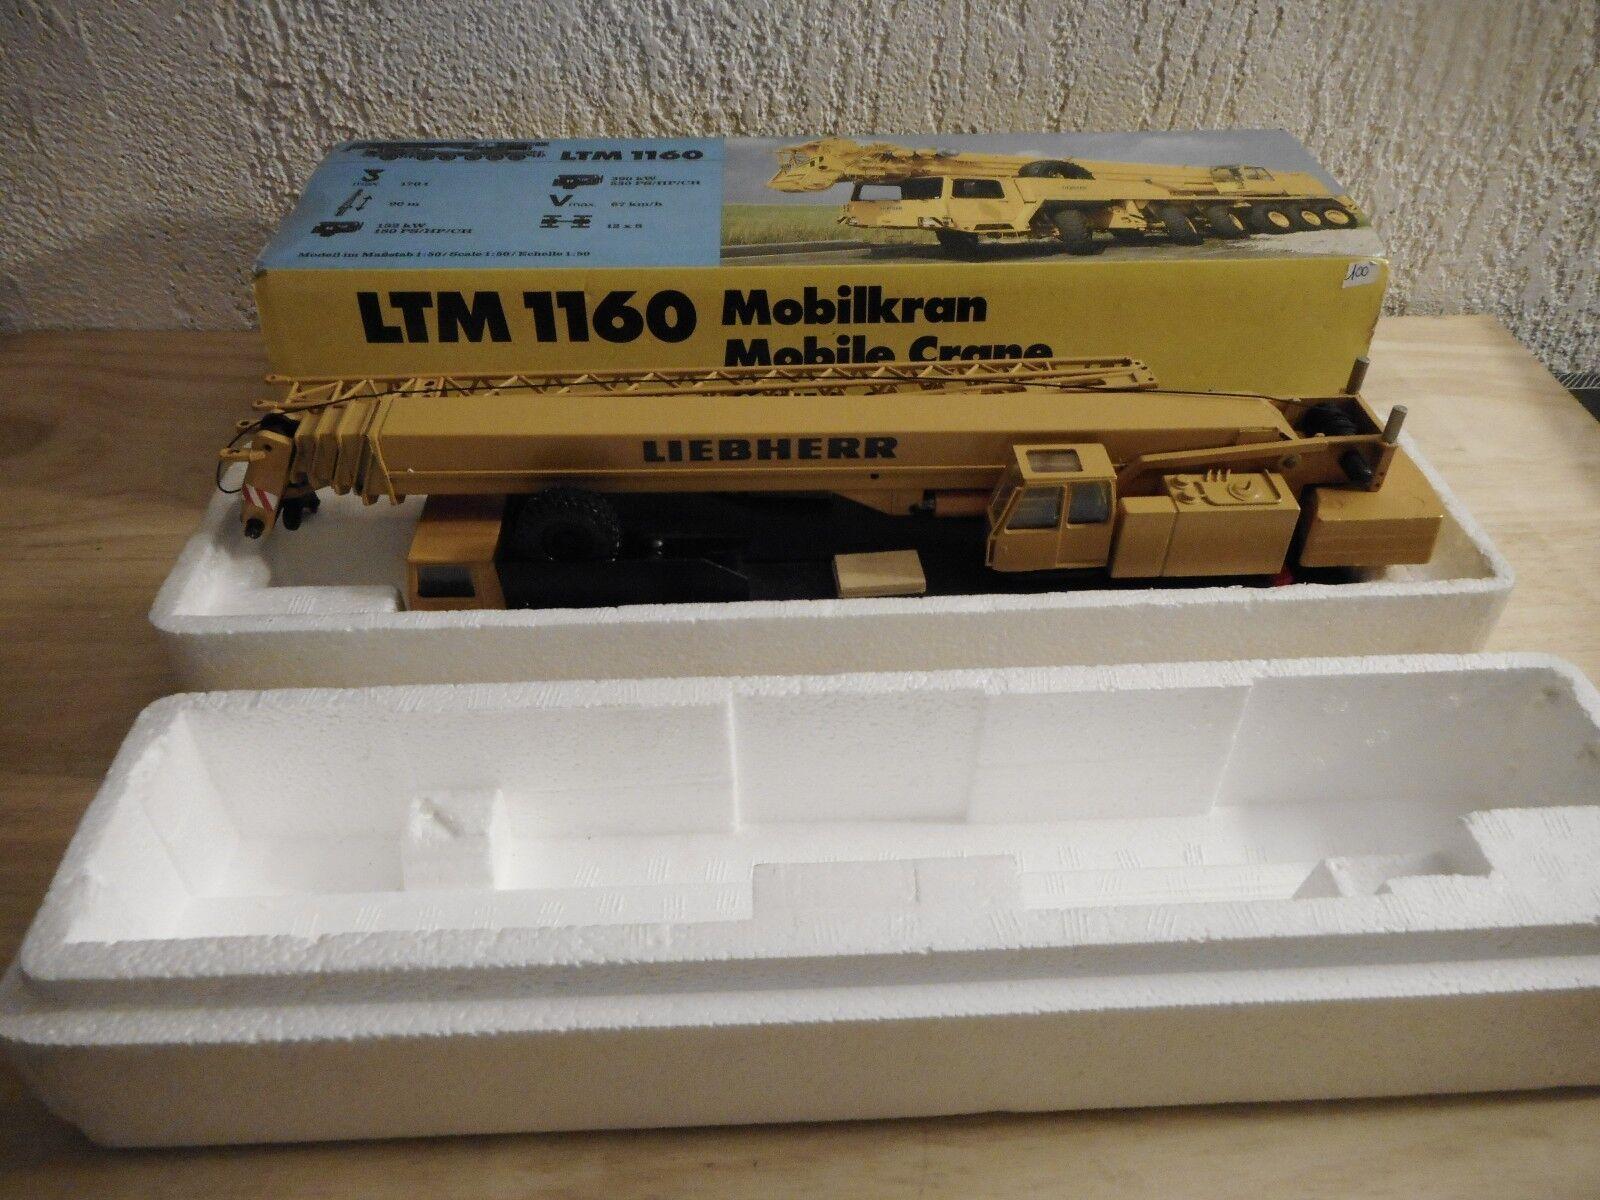 conrad n° 2082 grue grue grue automotrice LTM 1160 LIEBHERR  1/50  nzg fc5be2